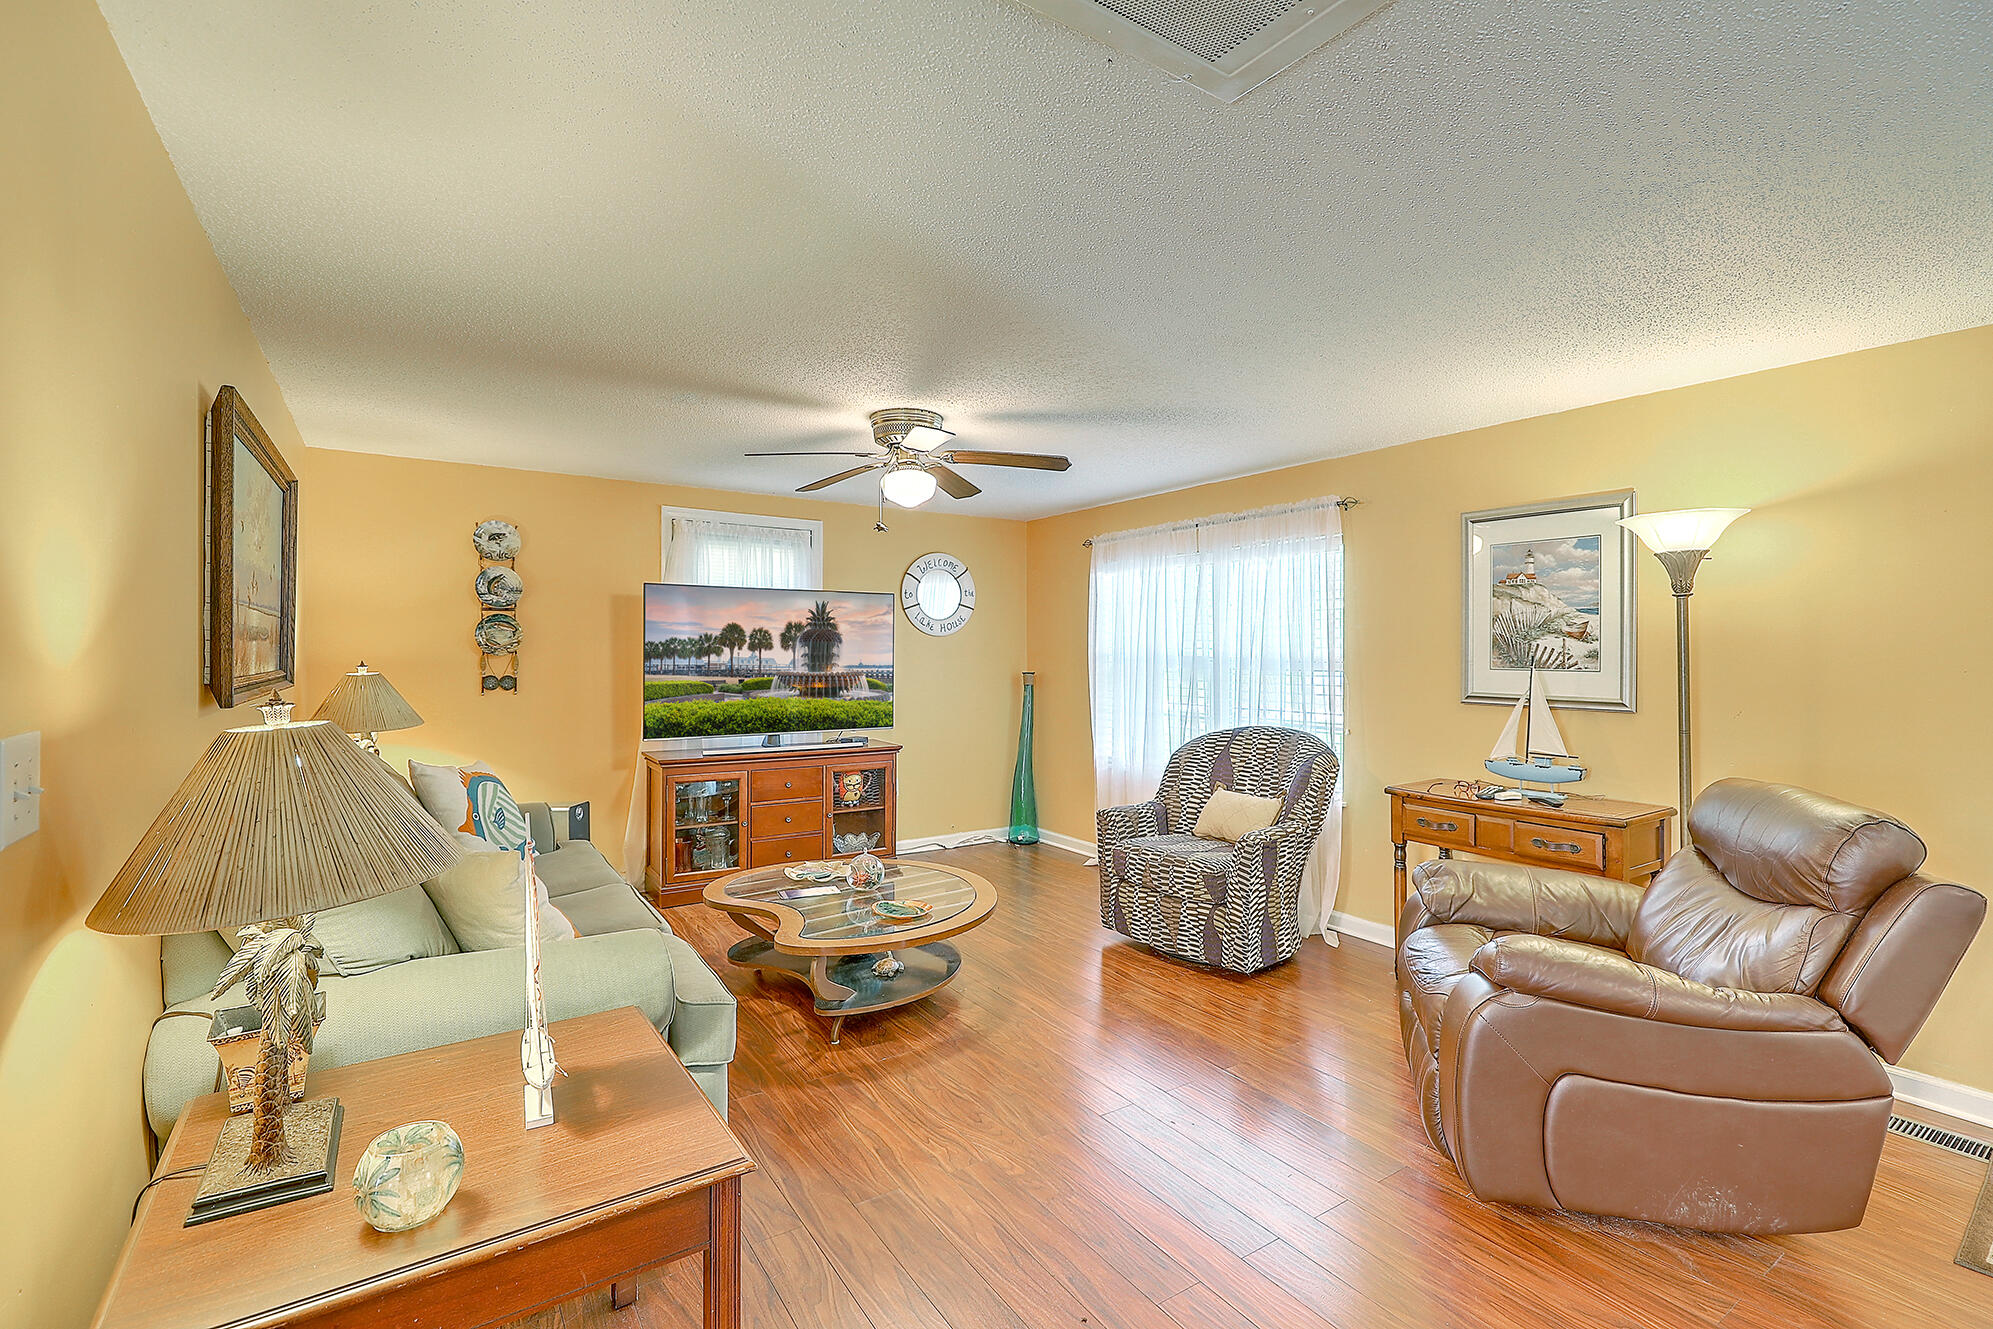 Cross Area (West) Homes For Sale - 128 Cherry Grove, Cross, SC - 28